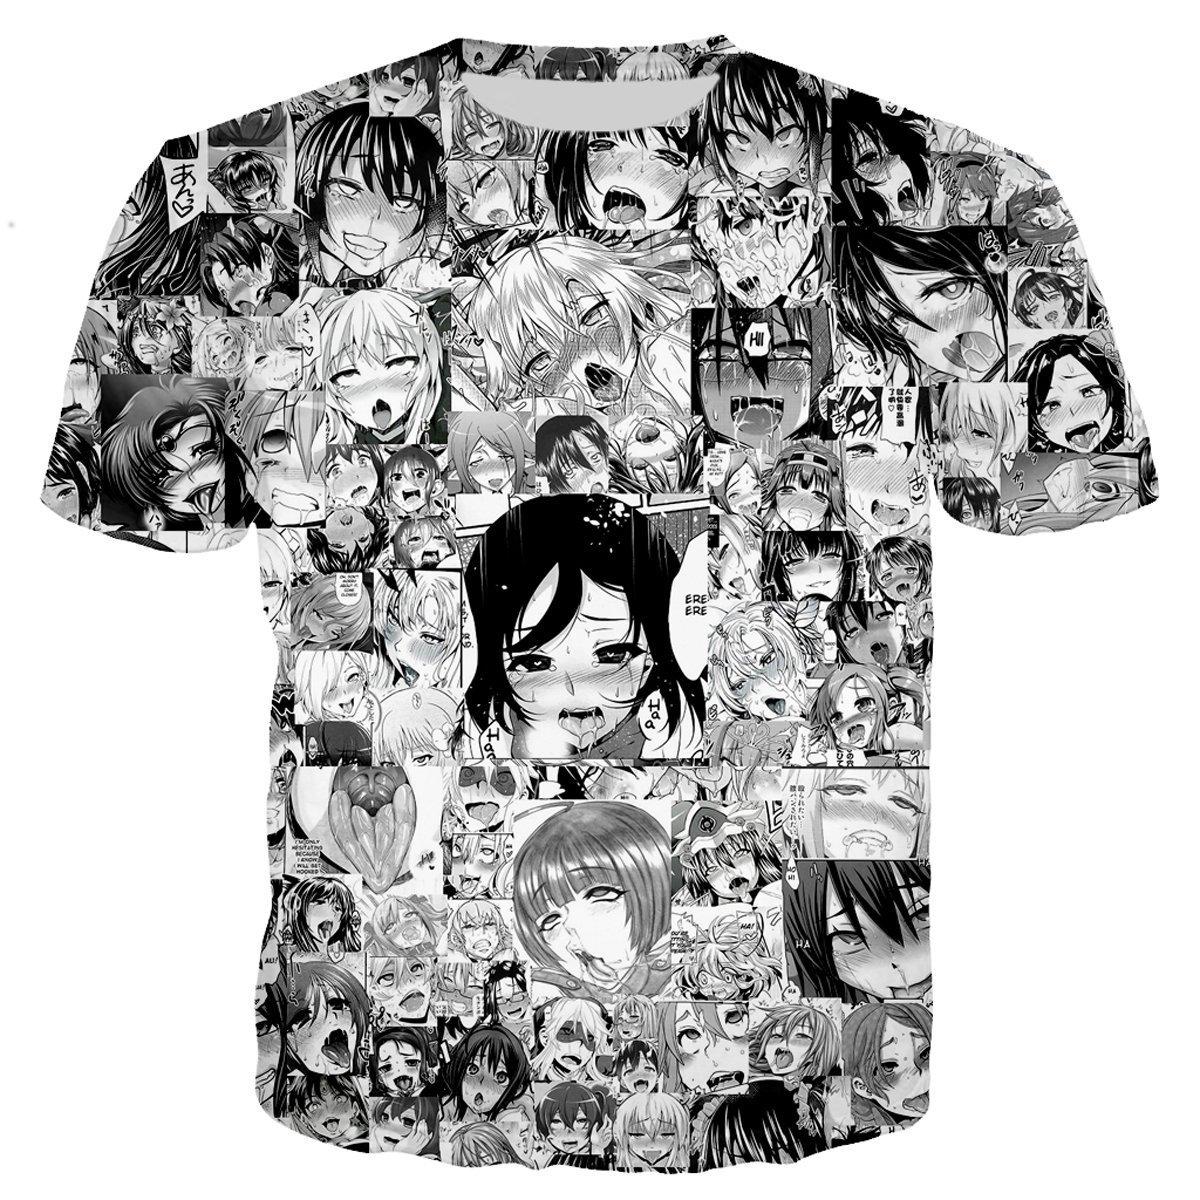 YX GIRL Unisex 3D Printed t Shirts Ahegao t Shirt Summer t-Shirt (XXL/3XL, 5-at-2)